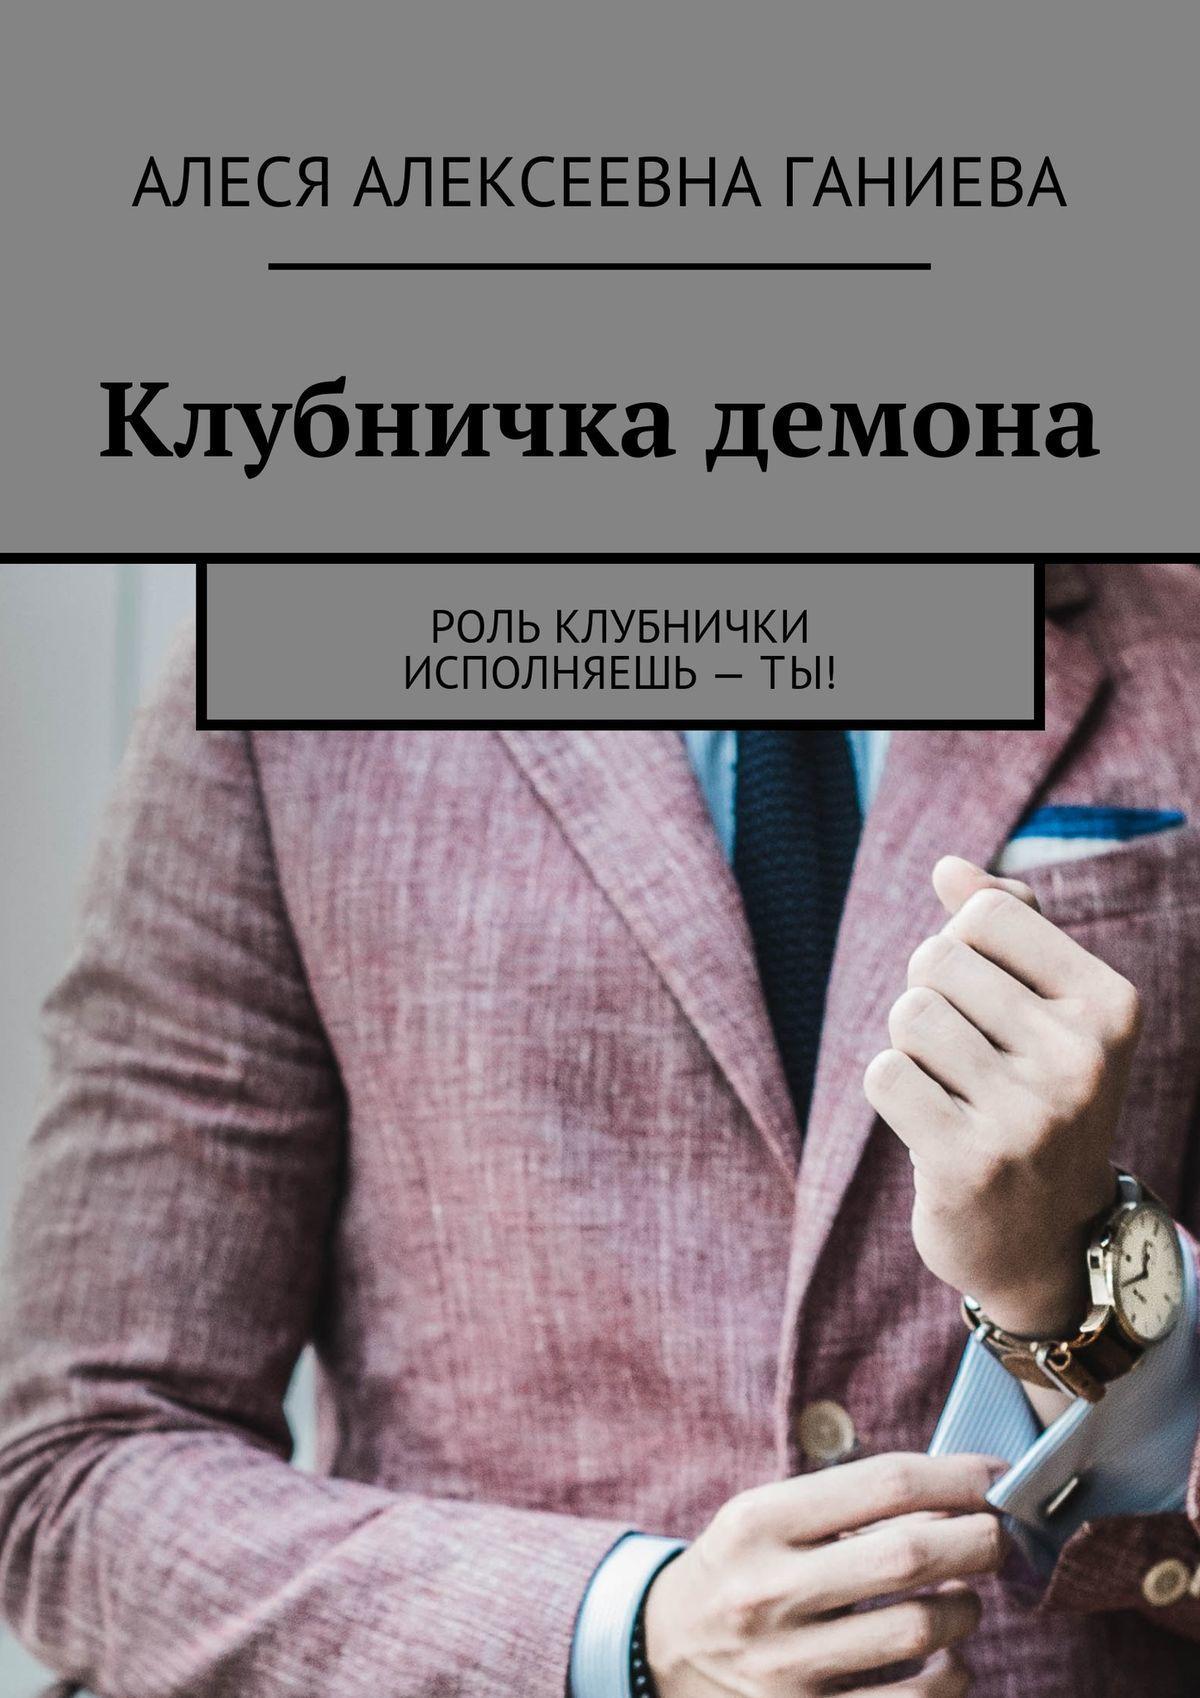 Обложка книги Клубничка демона, автор Алеся Алексеевна Ганиева